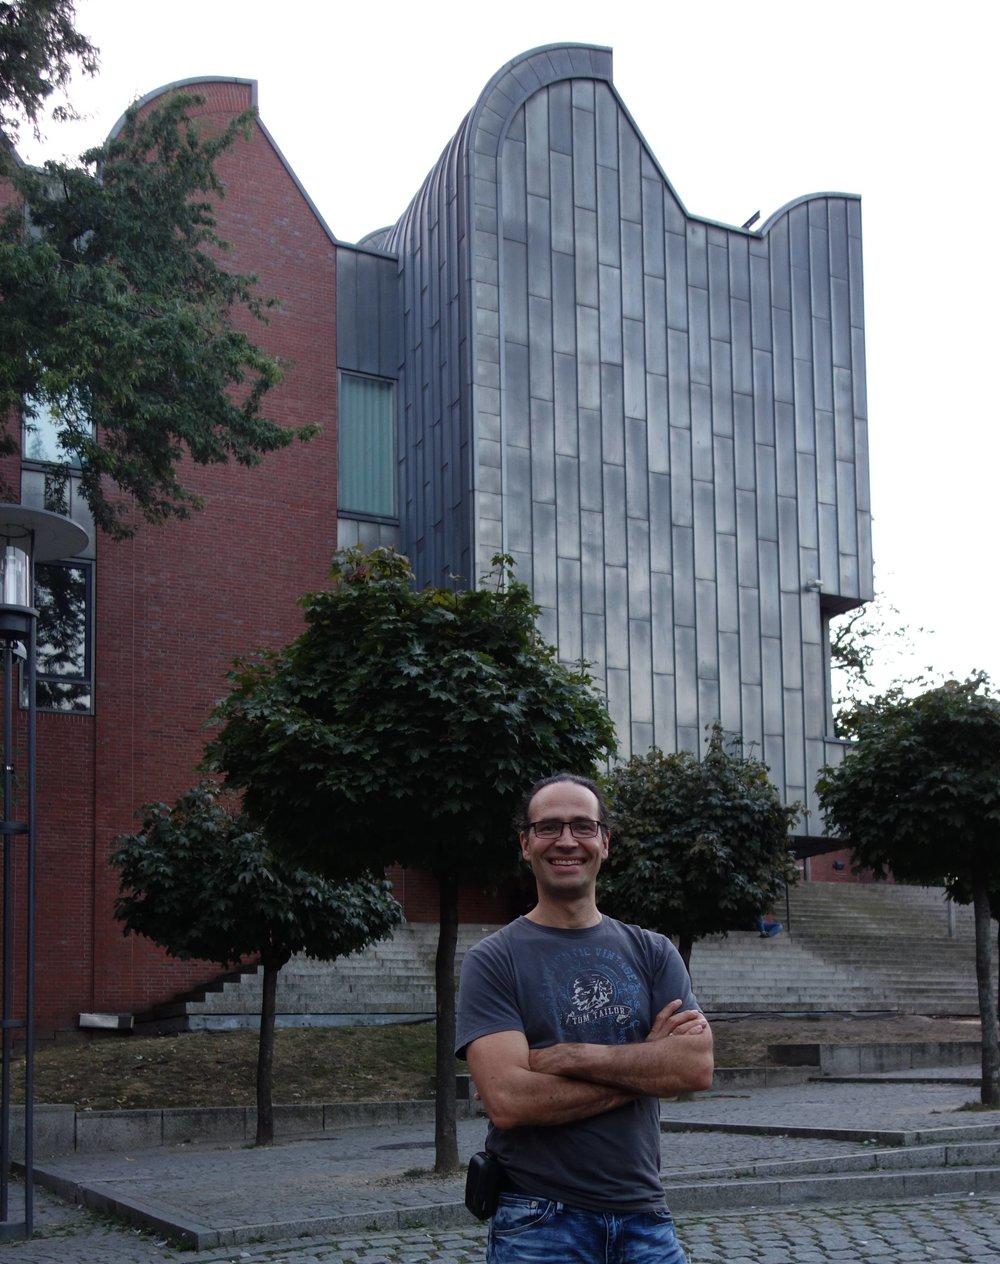 Wise Guys Eddi Philharmonie Köln September 2016.jpg